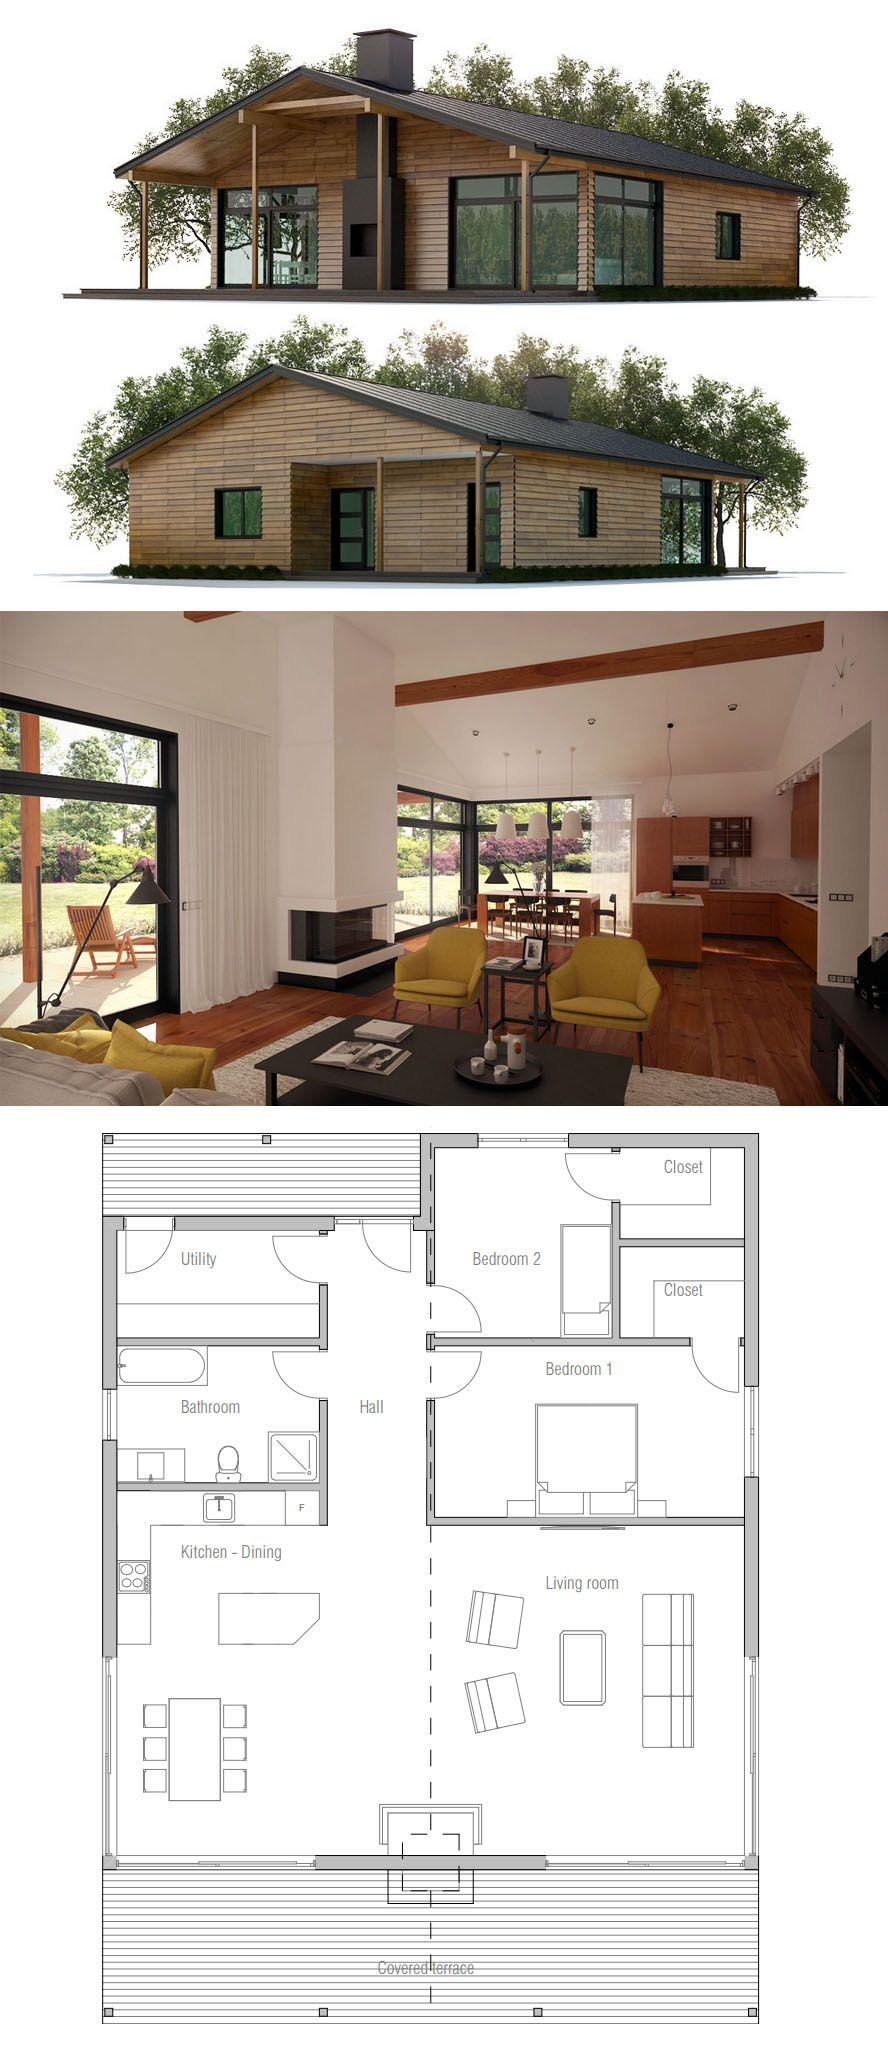 House plan ch floor area m building area m bedrooms